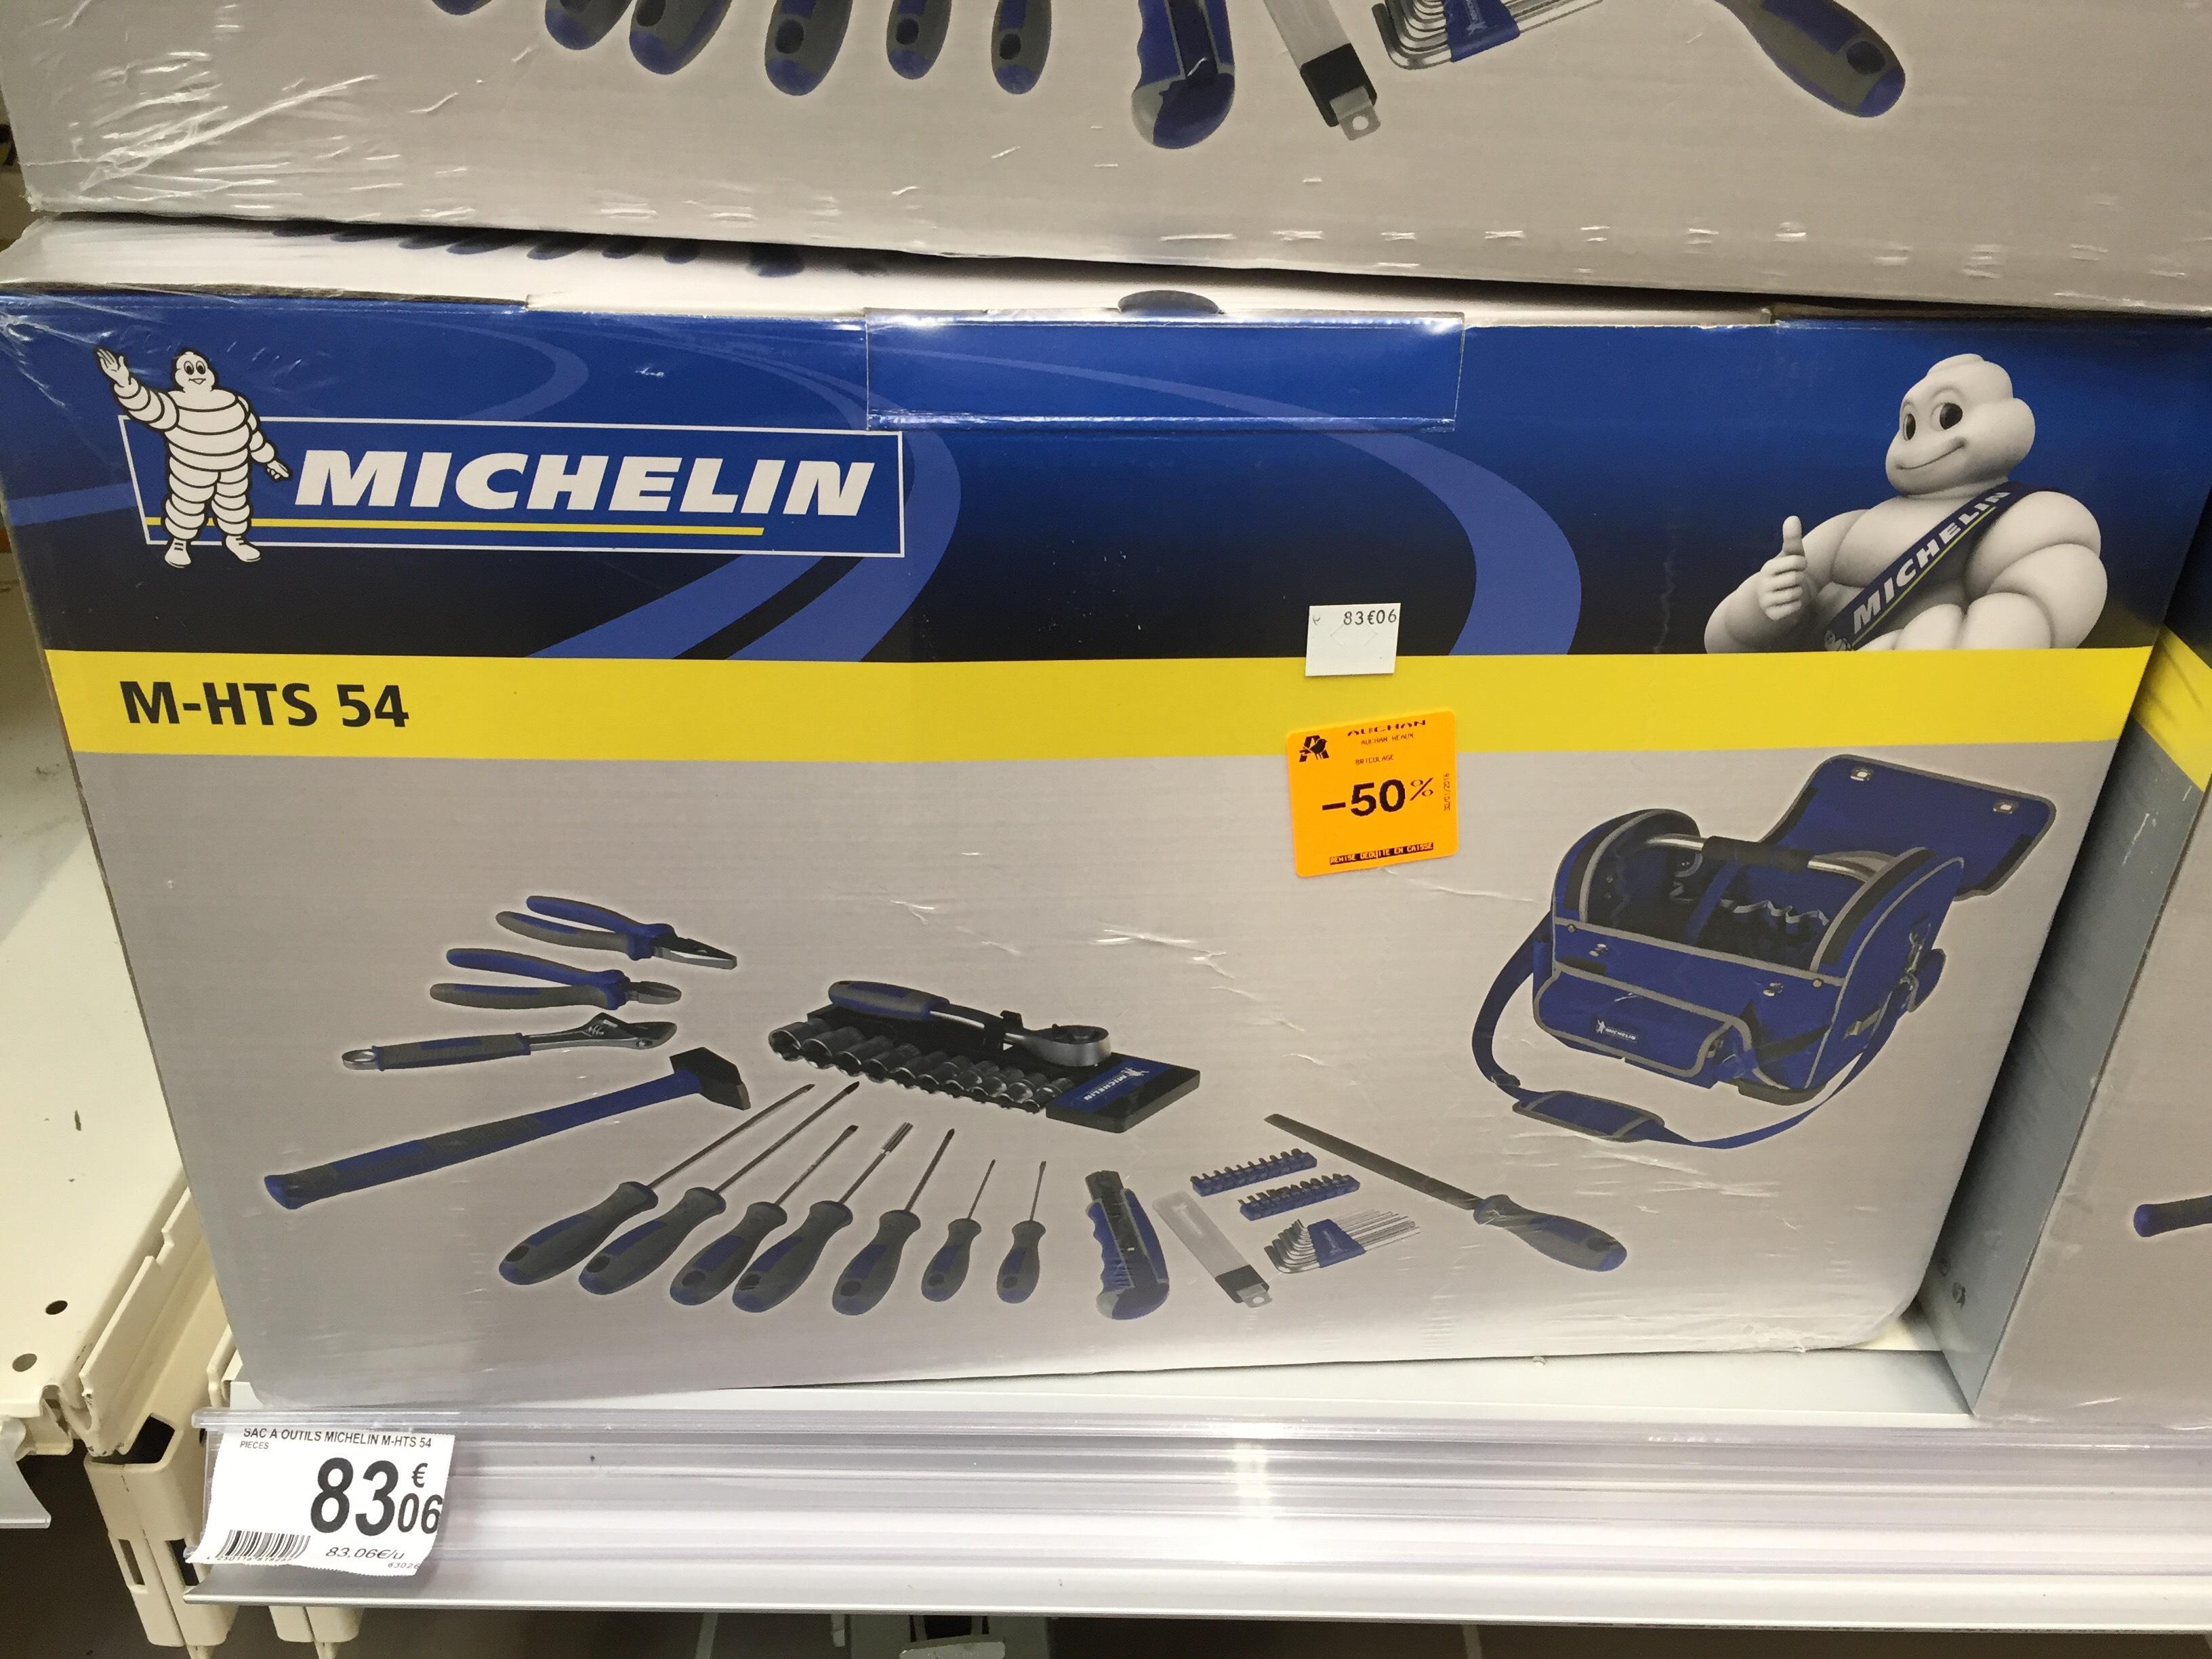 Sac à outils Michelin M-HTS 54